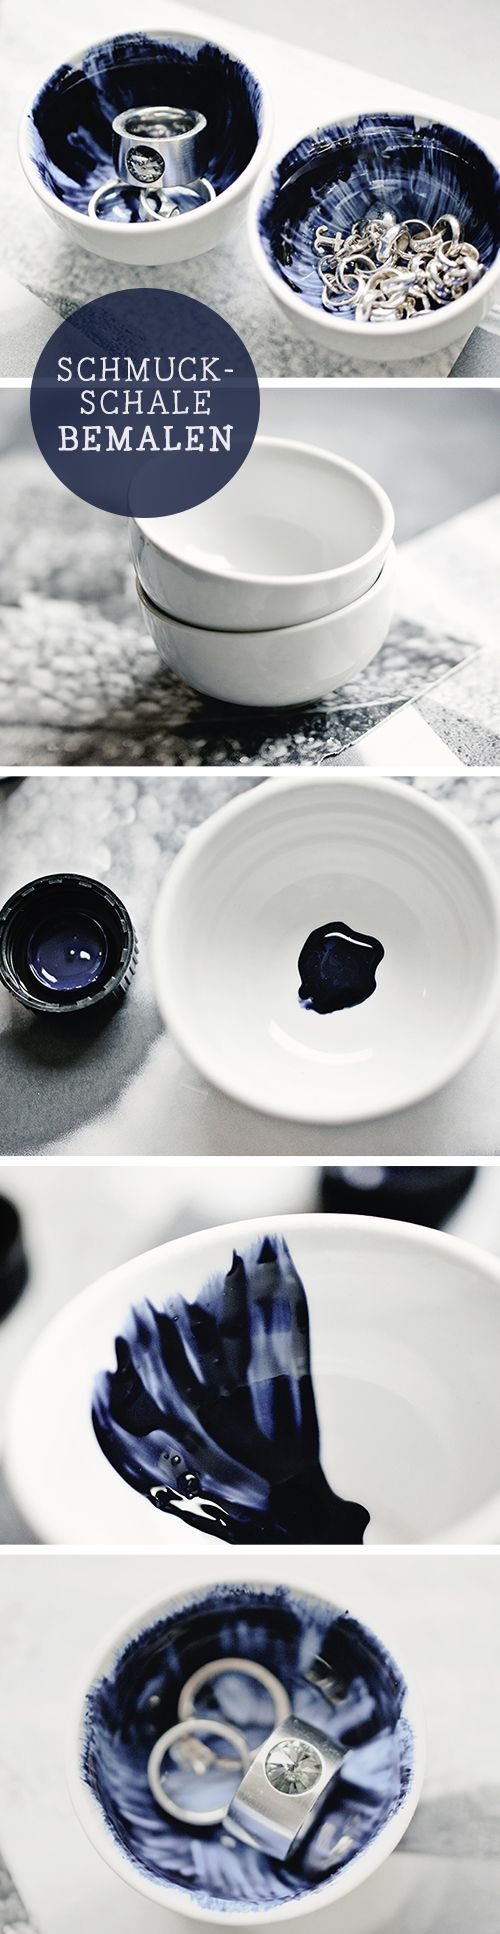 DIY-Tutorial für eine selbstgefärbte Schmuckschale im Shibori Stil / shibori styled jewellery bowl, diy tutorial via DaWanda.com